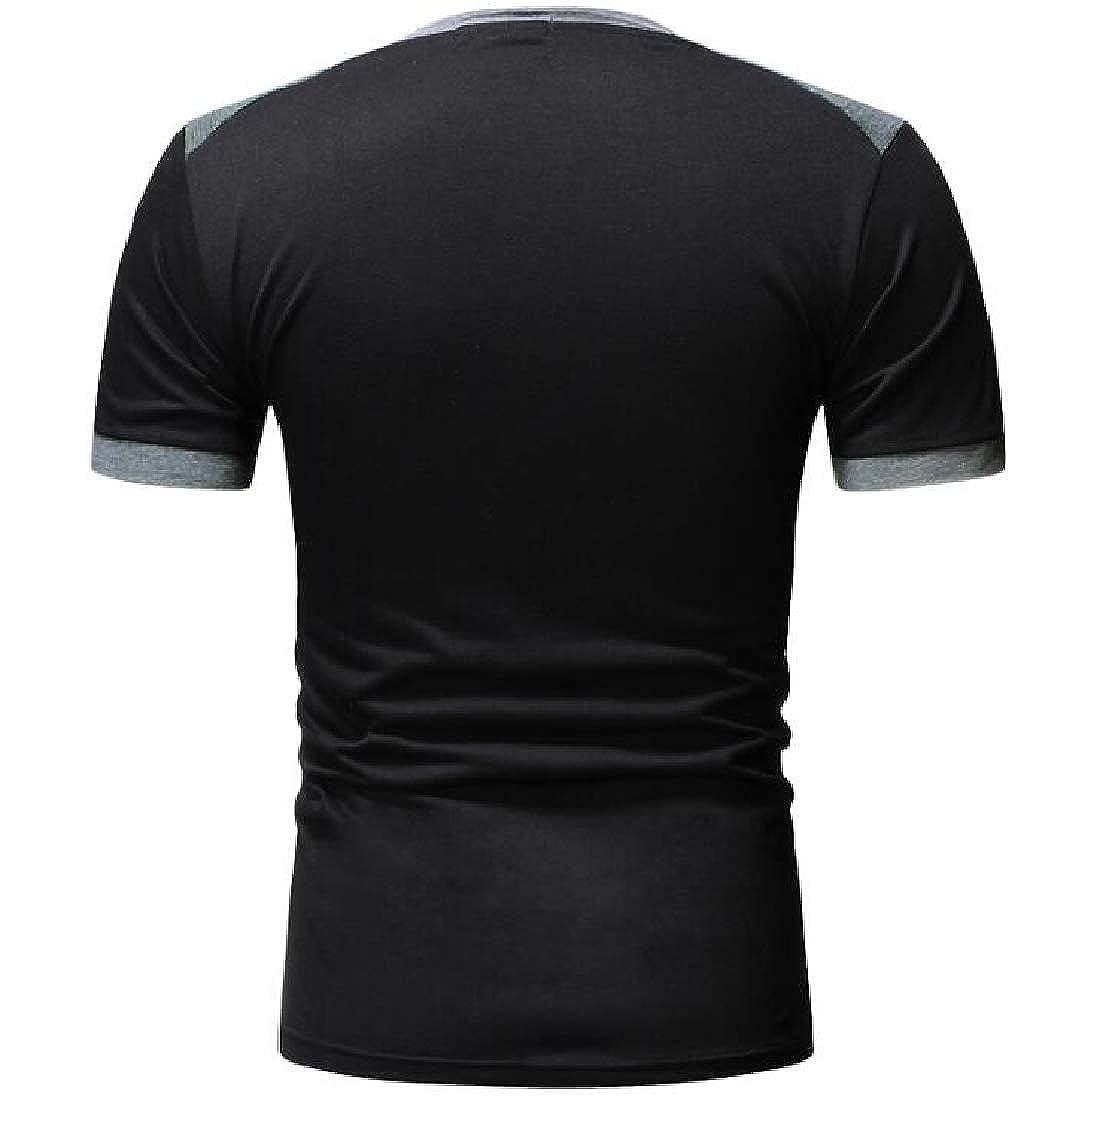 Nanquan Men Color Block Short Sleeve Basic Crewneck Slim T-Shirt Tee